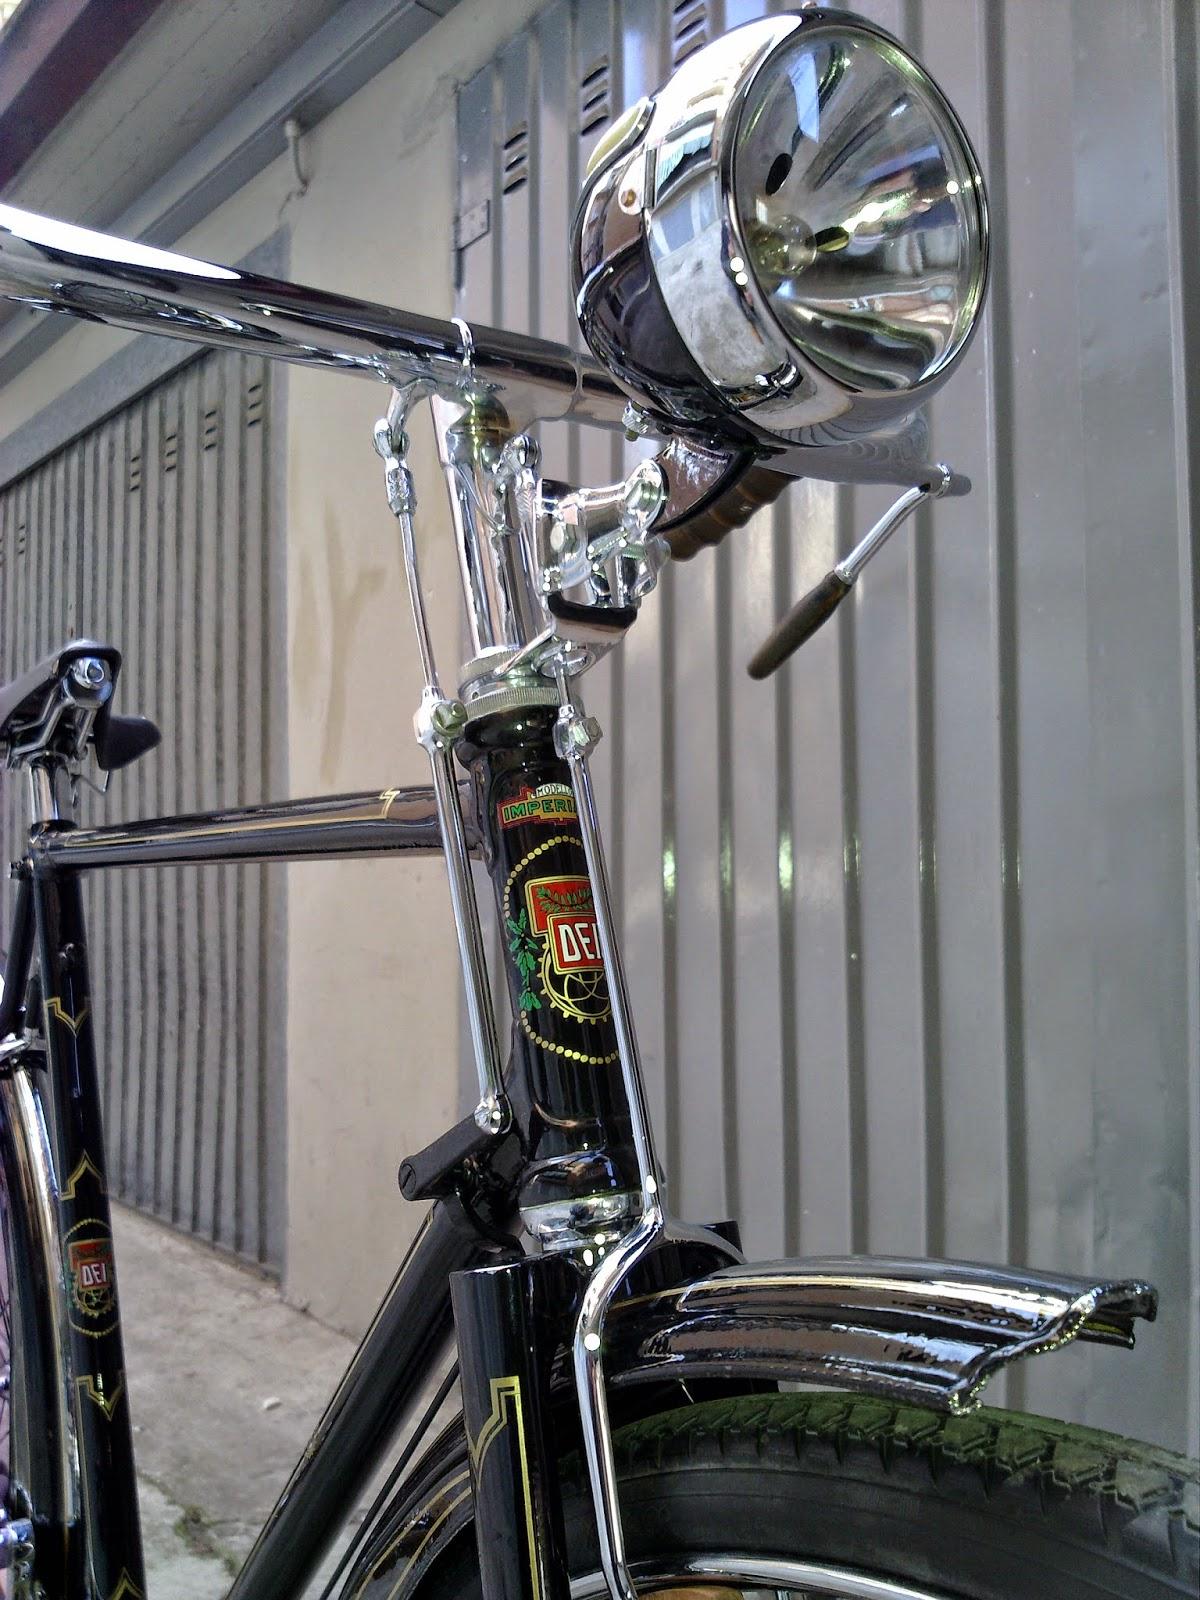 biciclette%2Bgian%2B2013%2B019.jpg